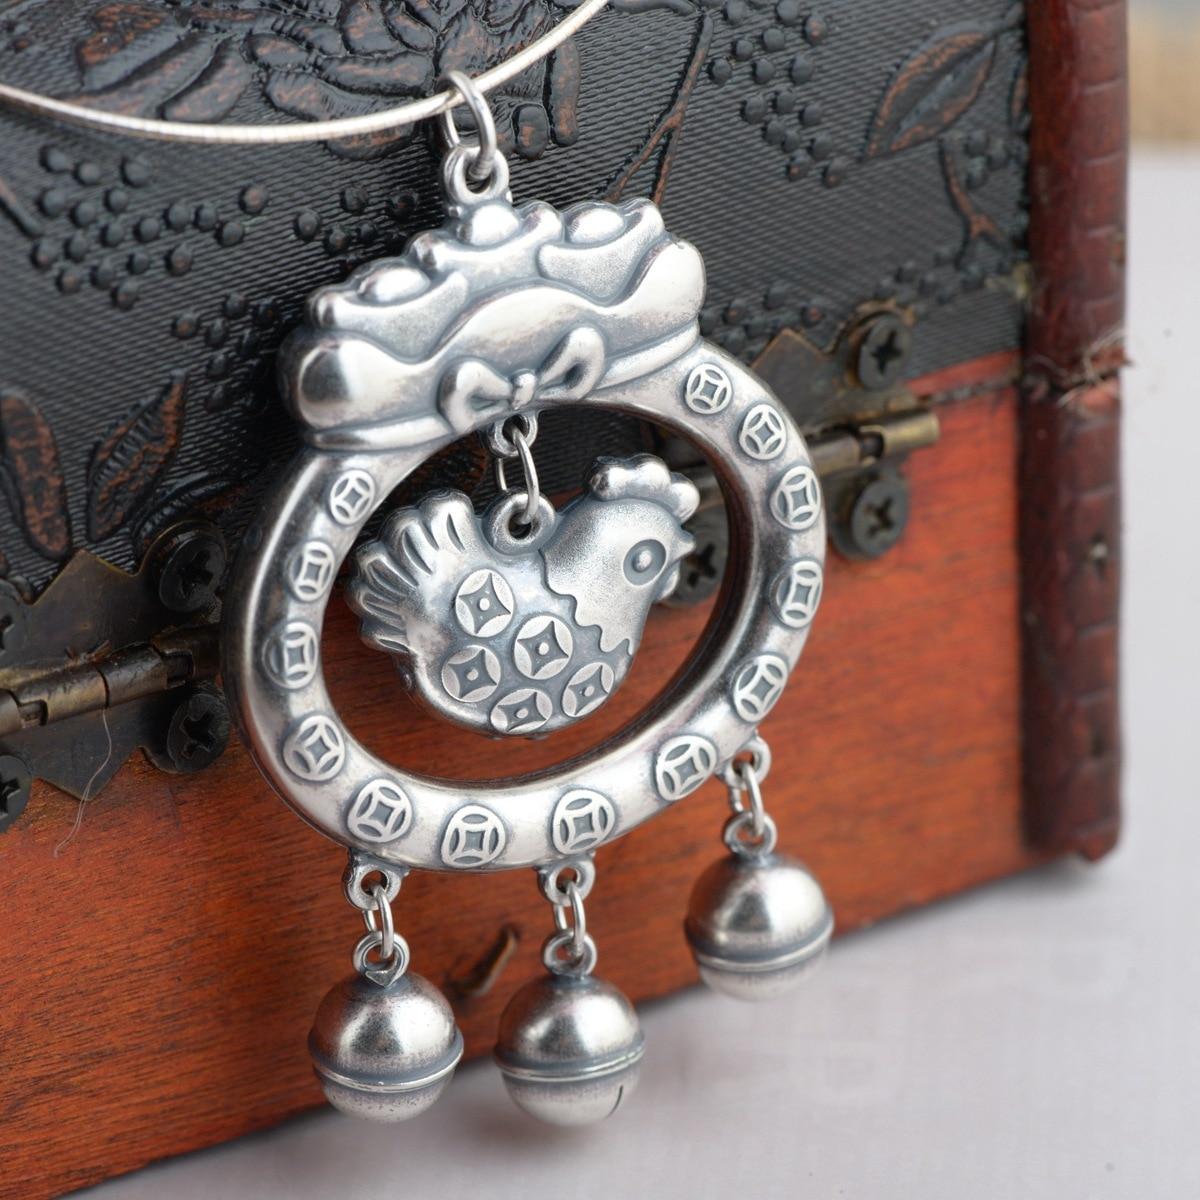 Cerf roi bijoux en gros argent S999 pendentif en argent fin positif style antique serrure